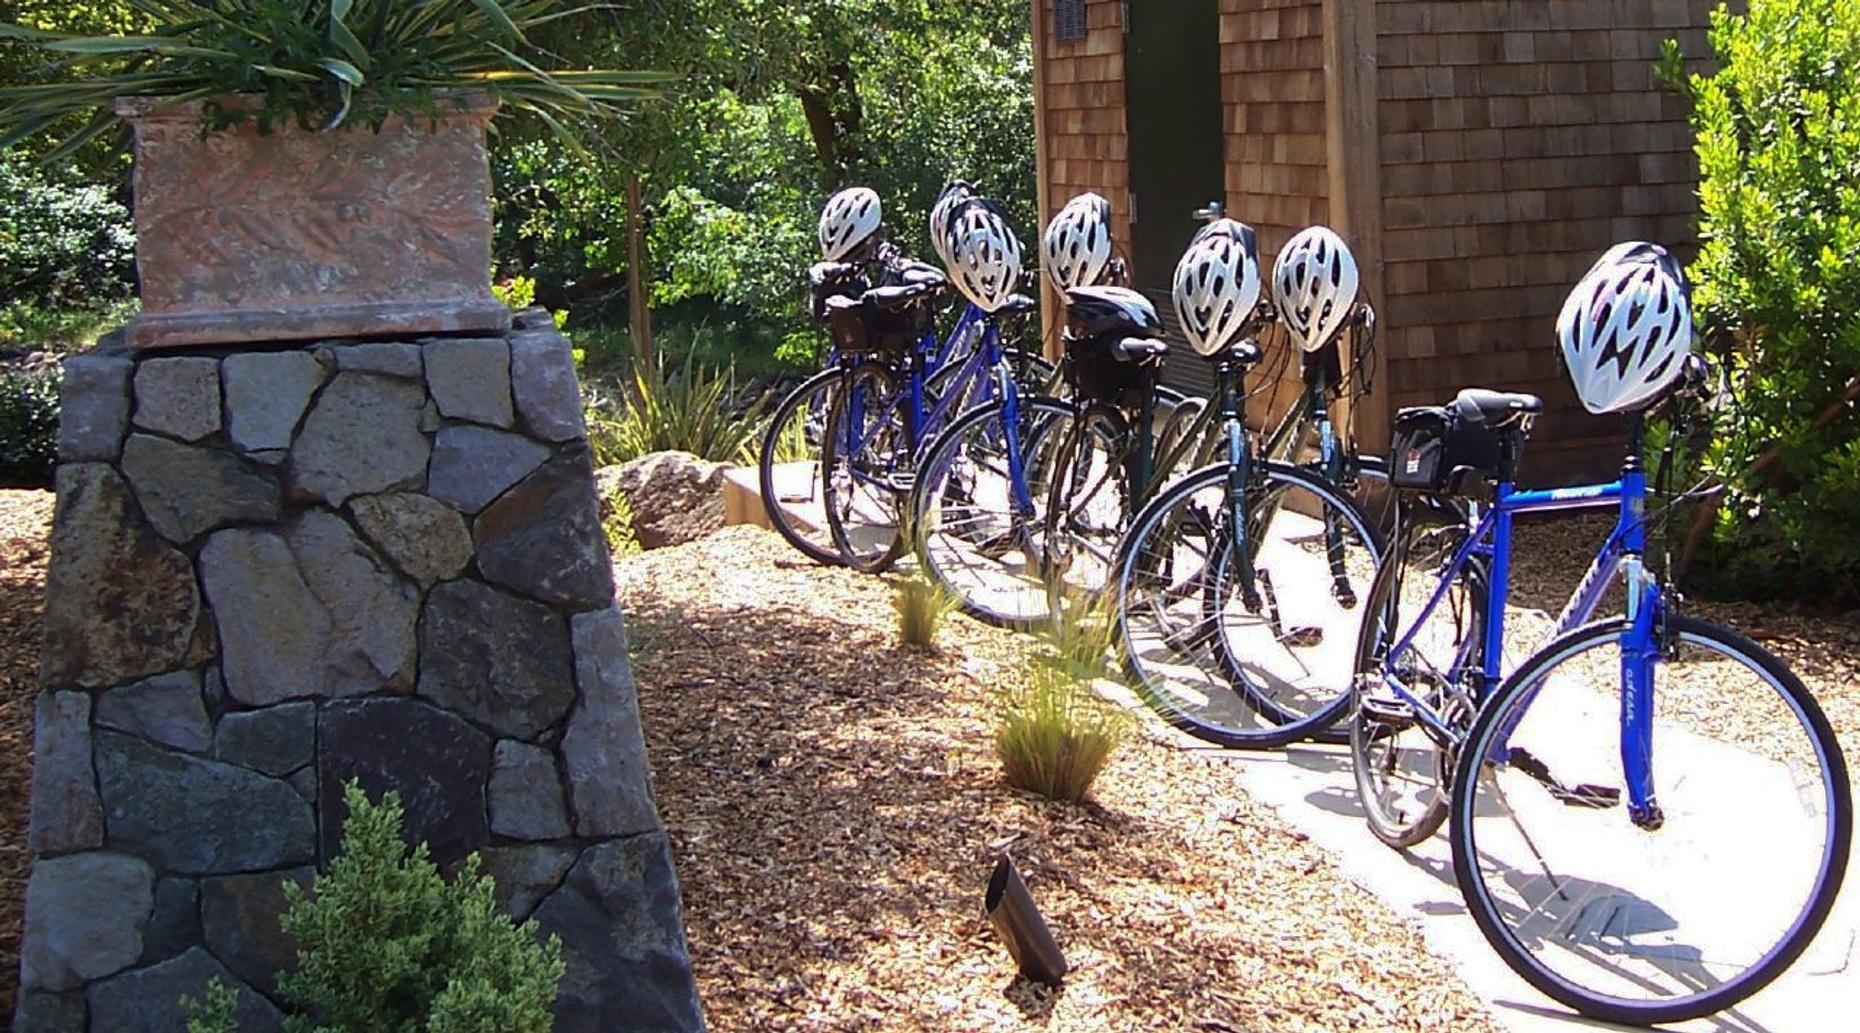 Pennington Scenic & Private Bike Tour